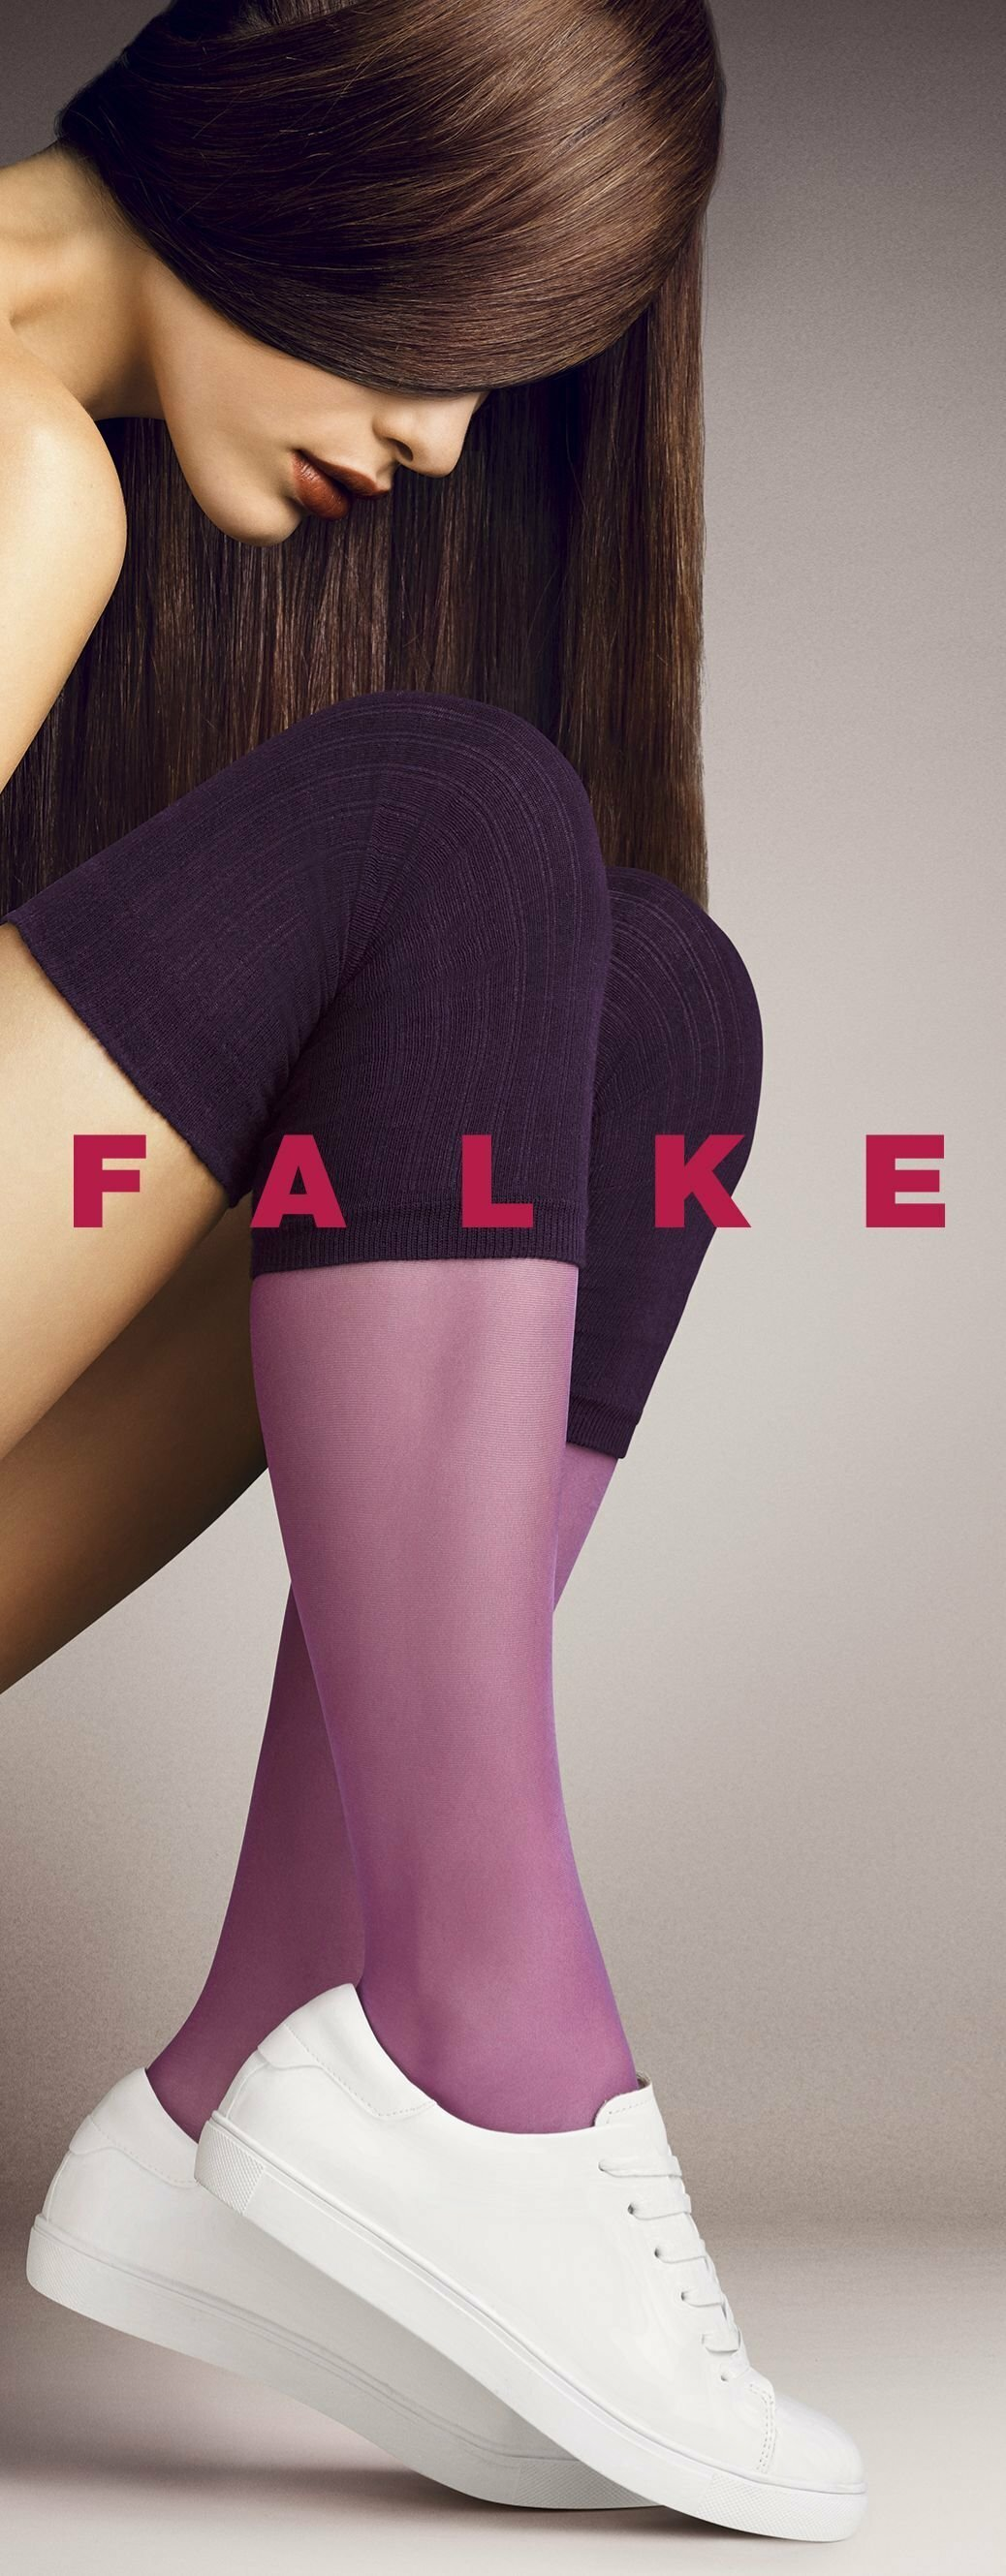 FALKE silk smooth 15 DEN ladies knee socks GOLDEN